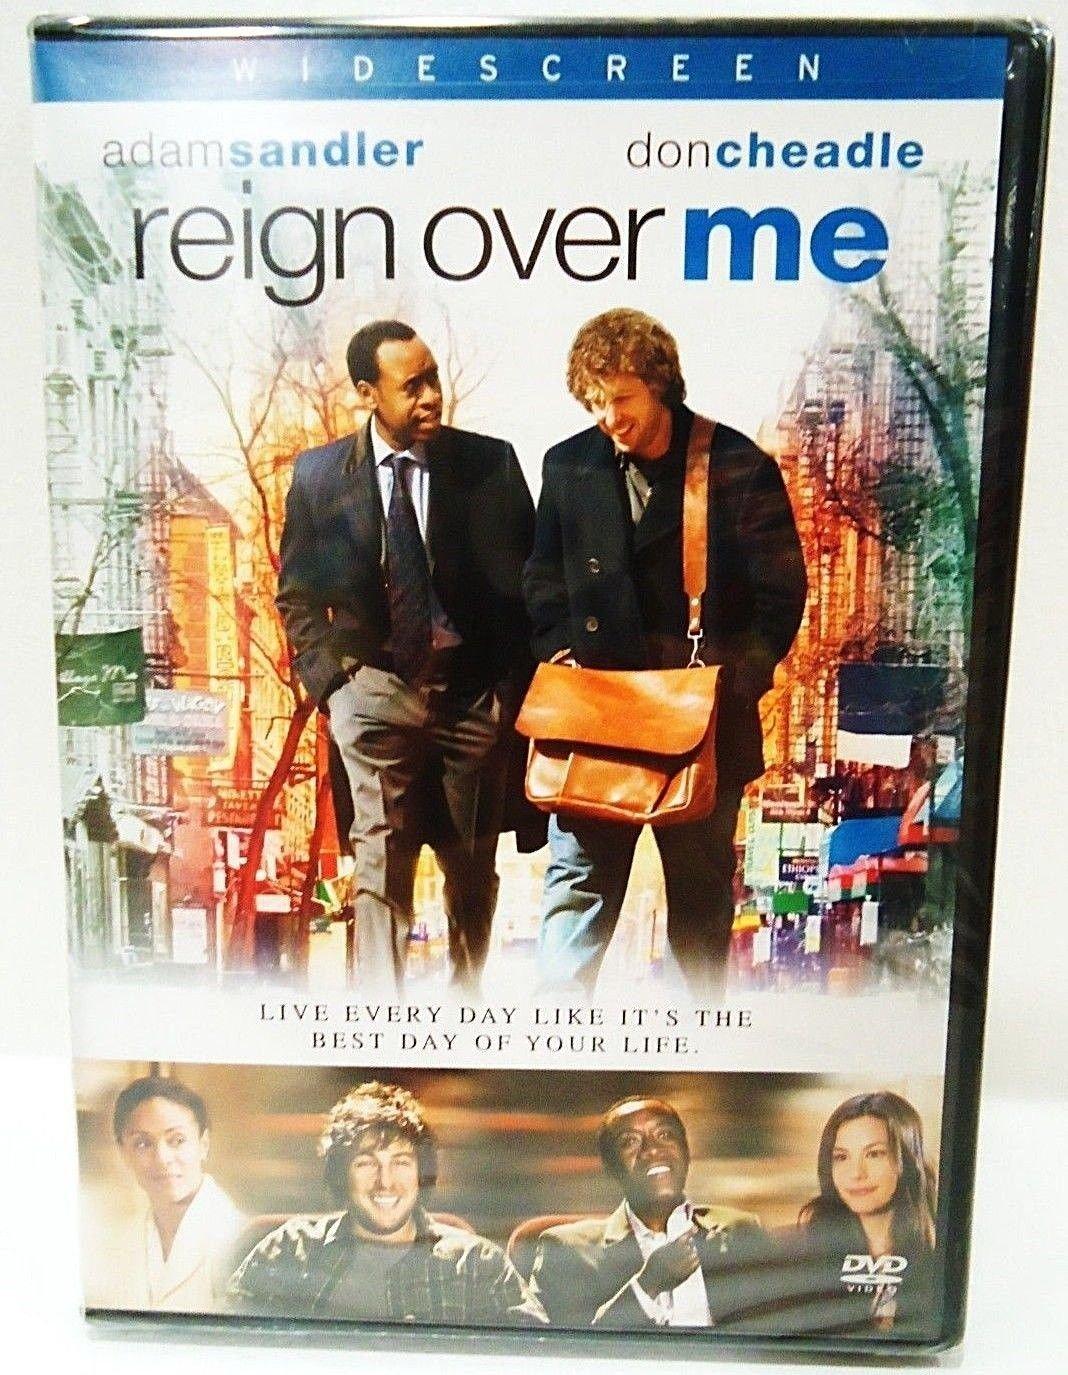 REIGN OVER ME - DVD - ADAM SANDLER - DON CHEADLE - NEW - COMEDY - DRAMA - MOVIE